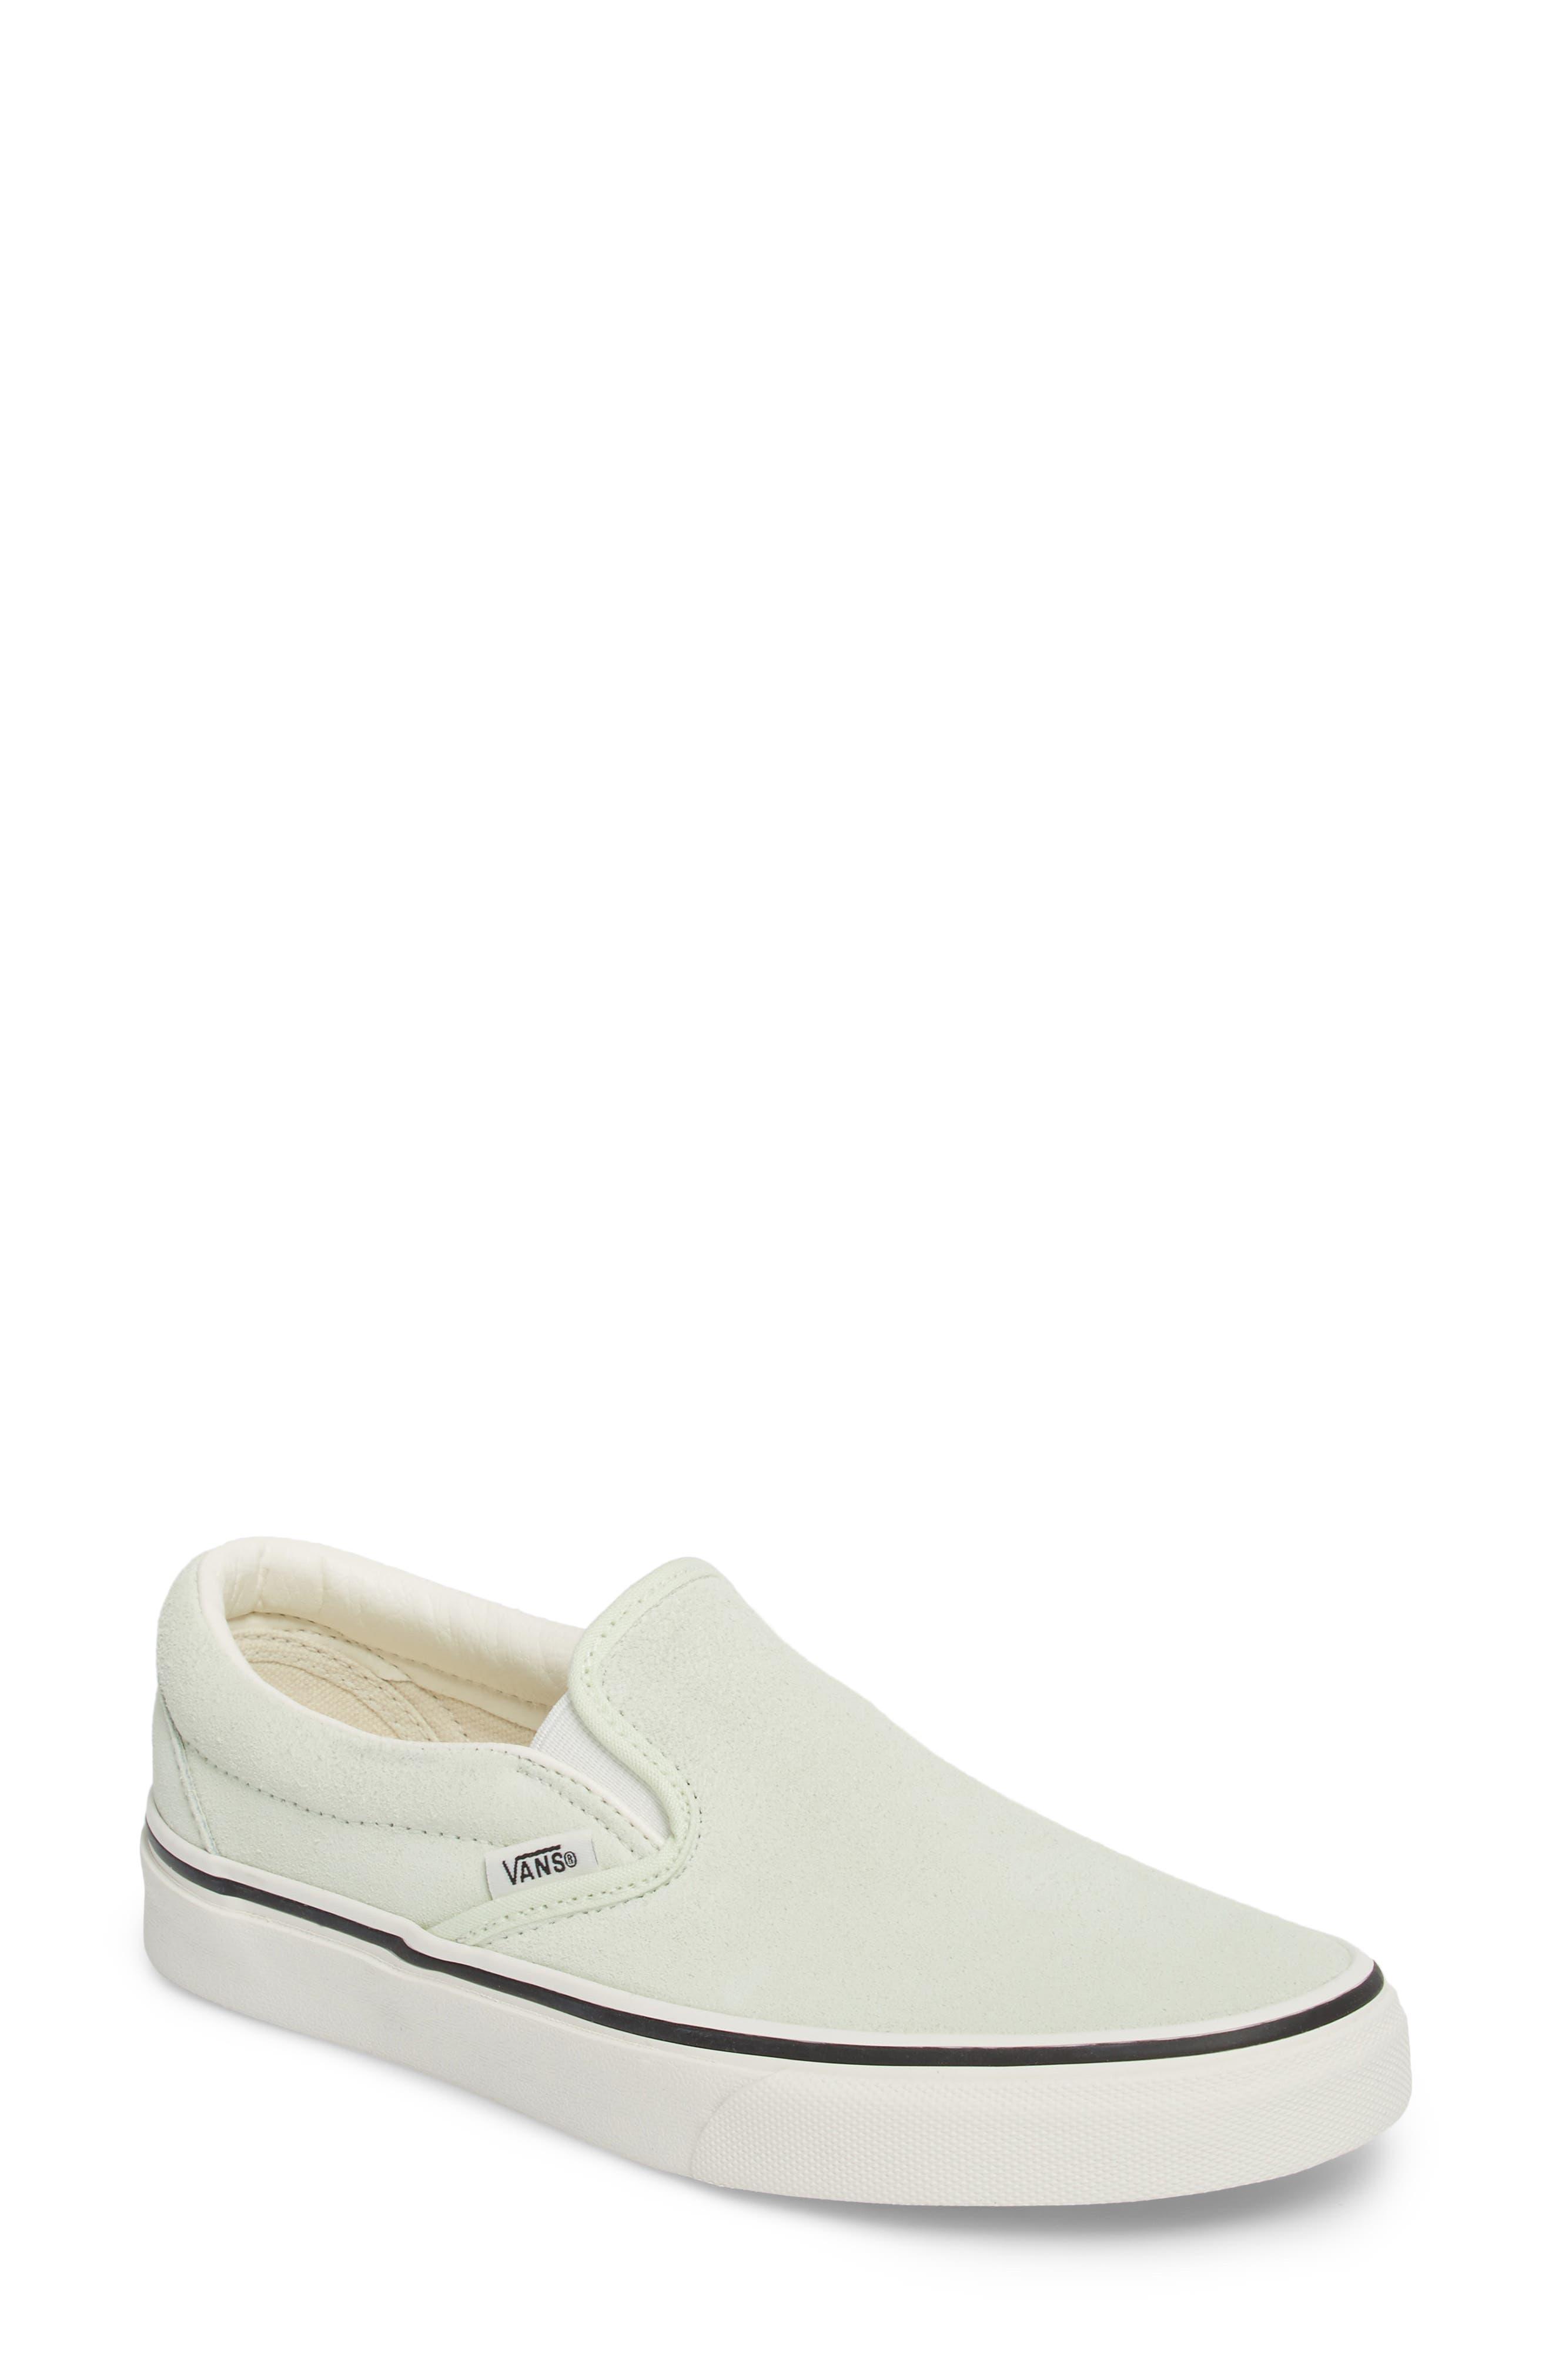 ,                             Classic Slip-On Sneaker,                             Main thumbnail 147, color,                             330